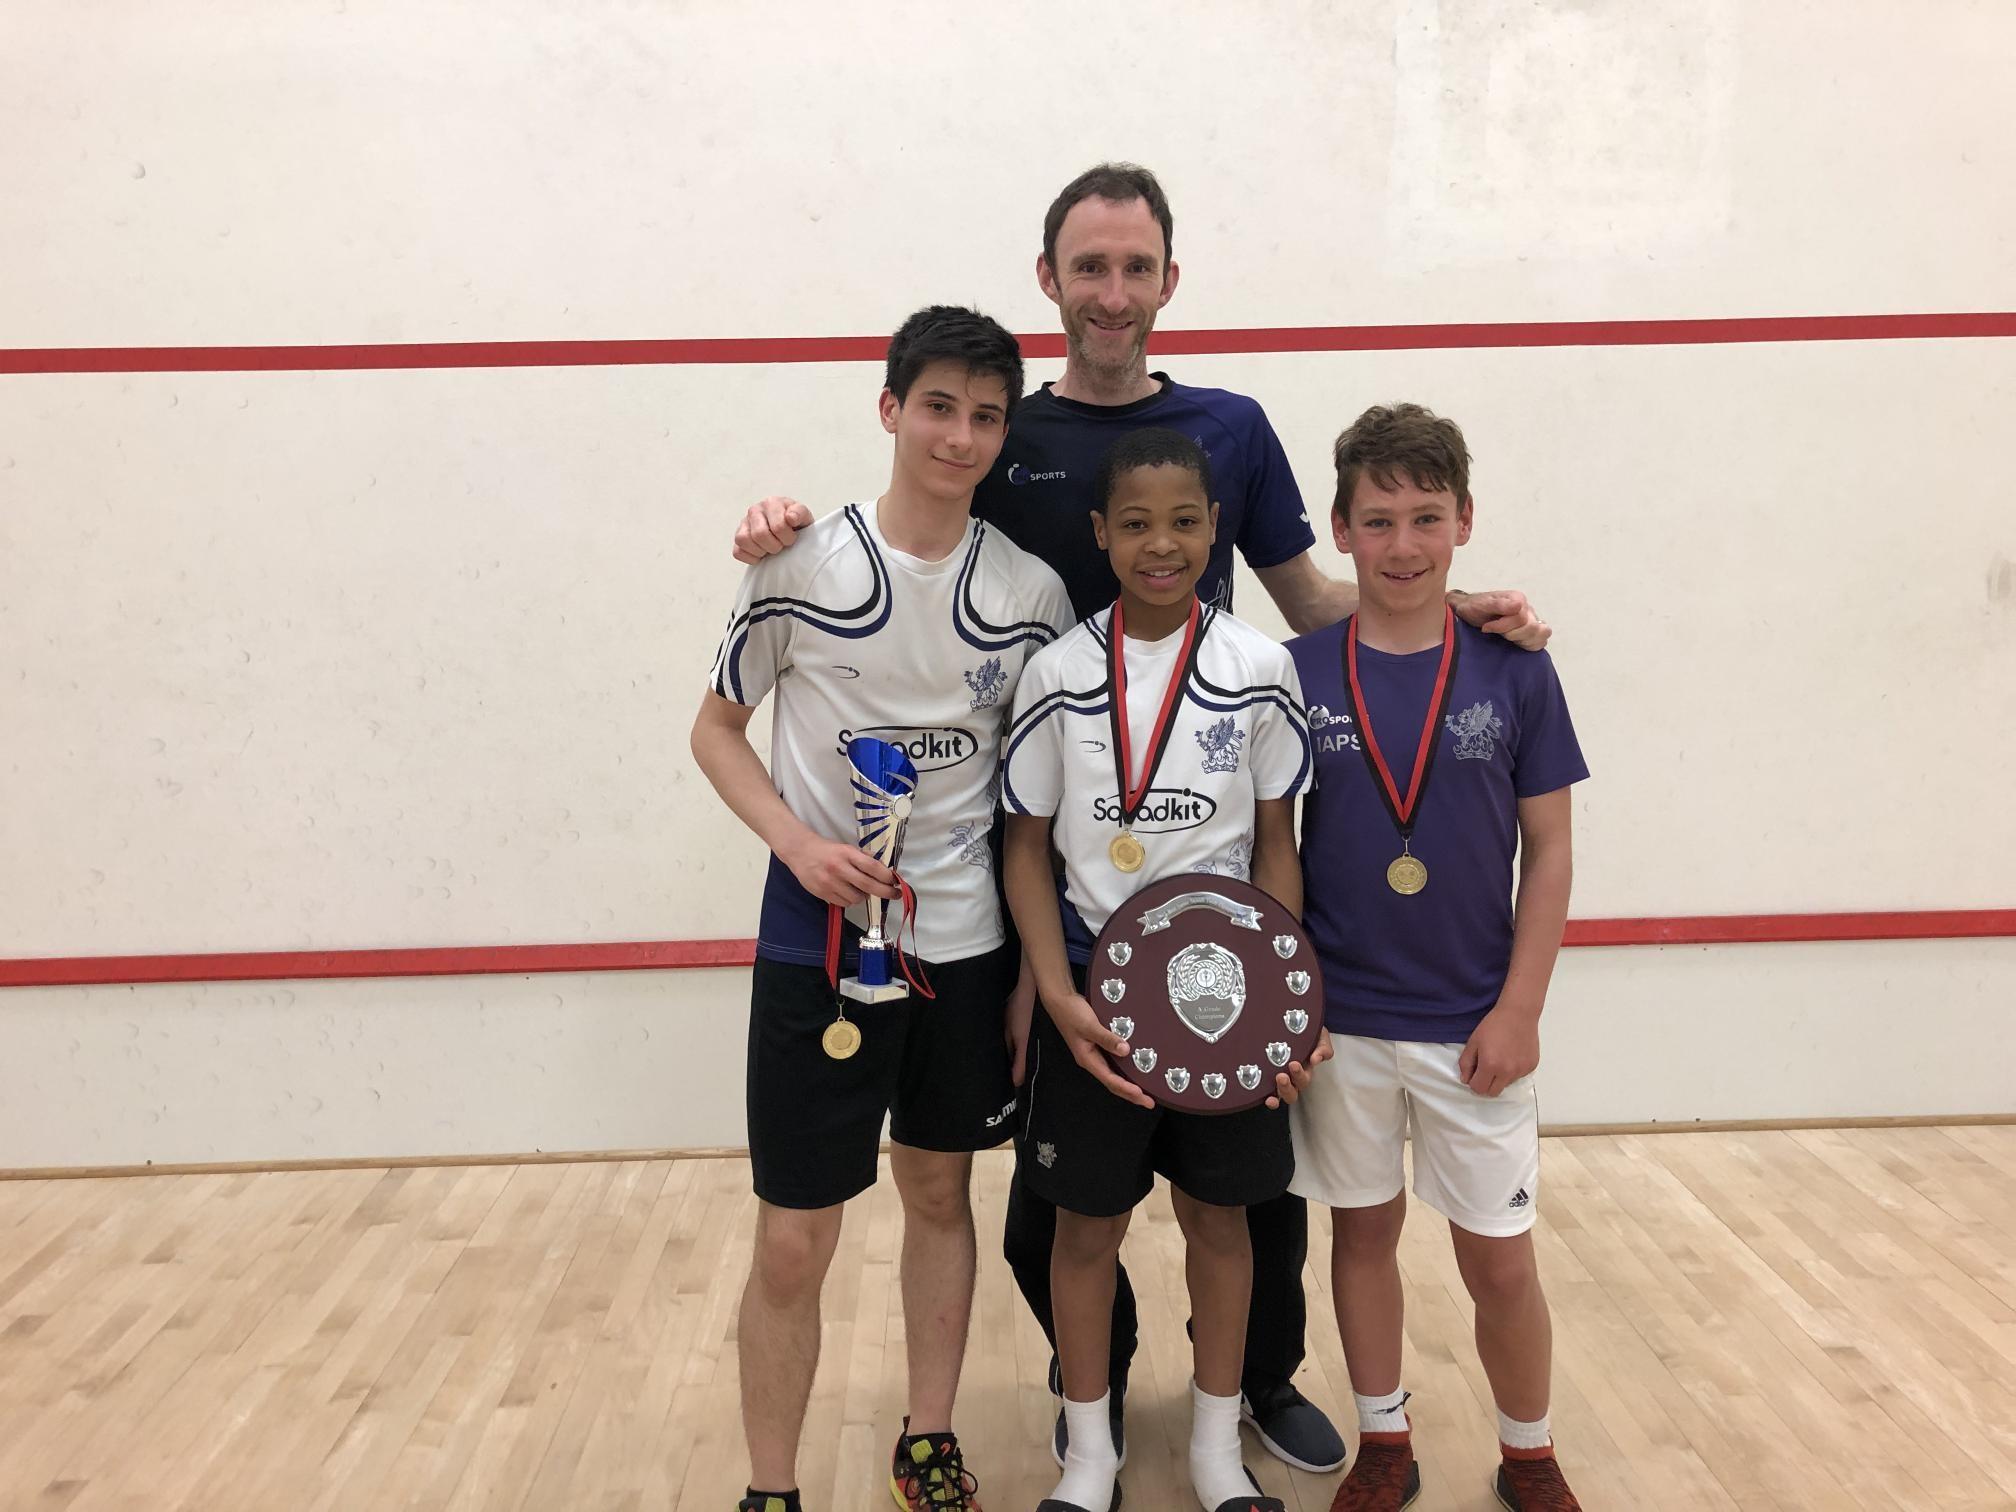 Exeter golf and country club, squash, junior squash, south west squash